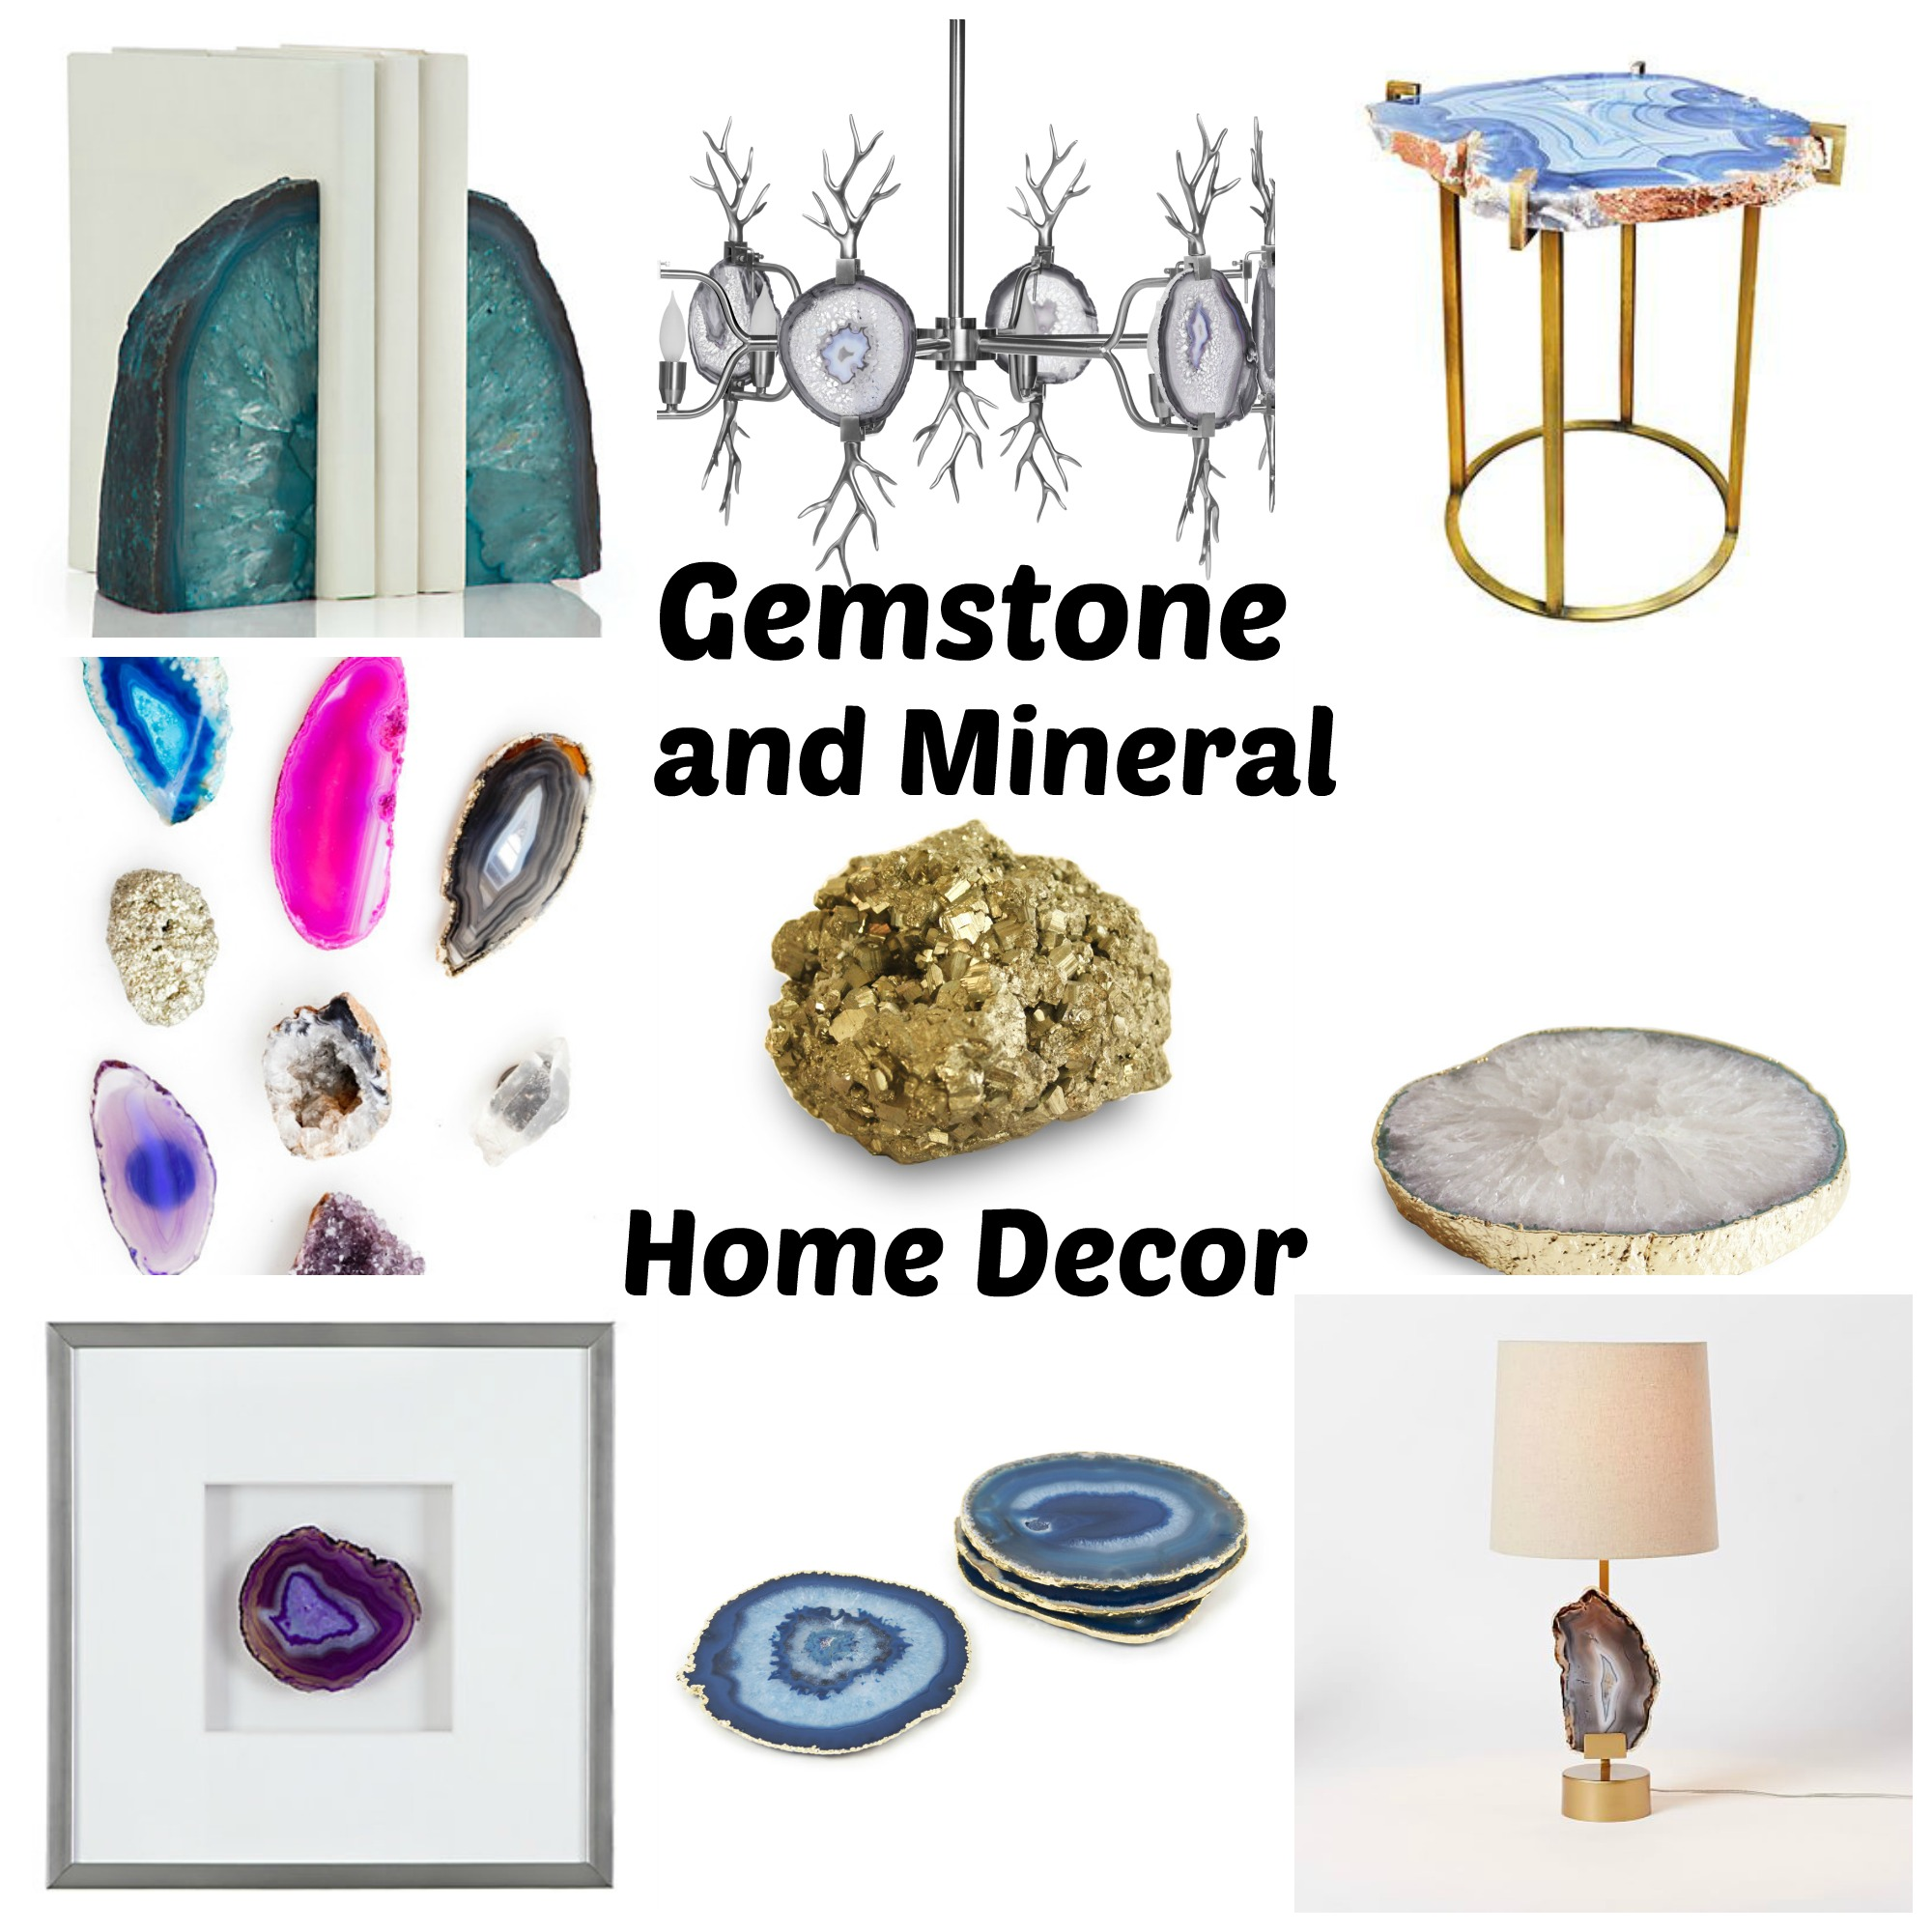 Gemstone And Mineral Home Decor Jenn And Tonic Home Decorators Catalog Best Ideas of Home Decor and Design [homedecoratorscatalog.us]